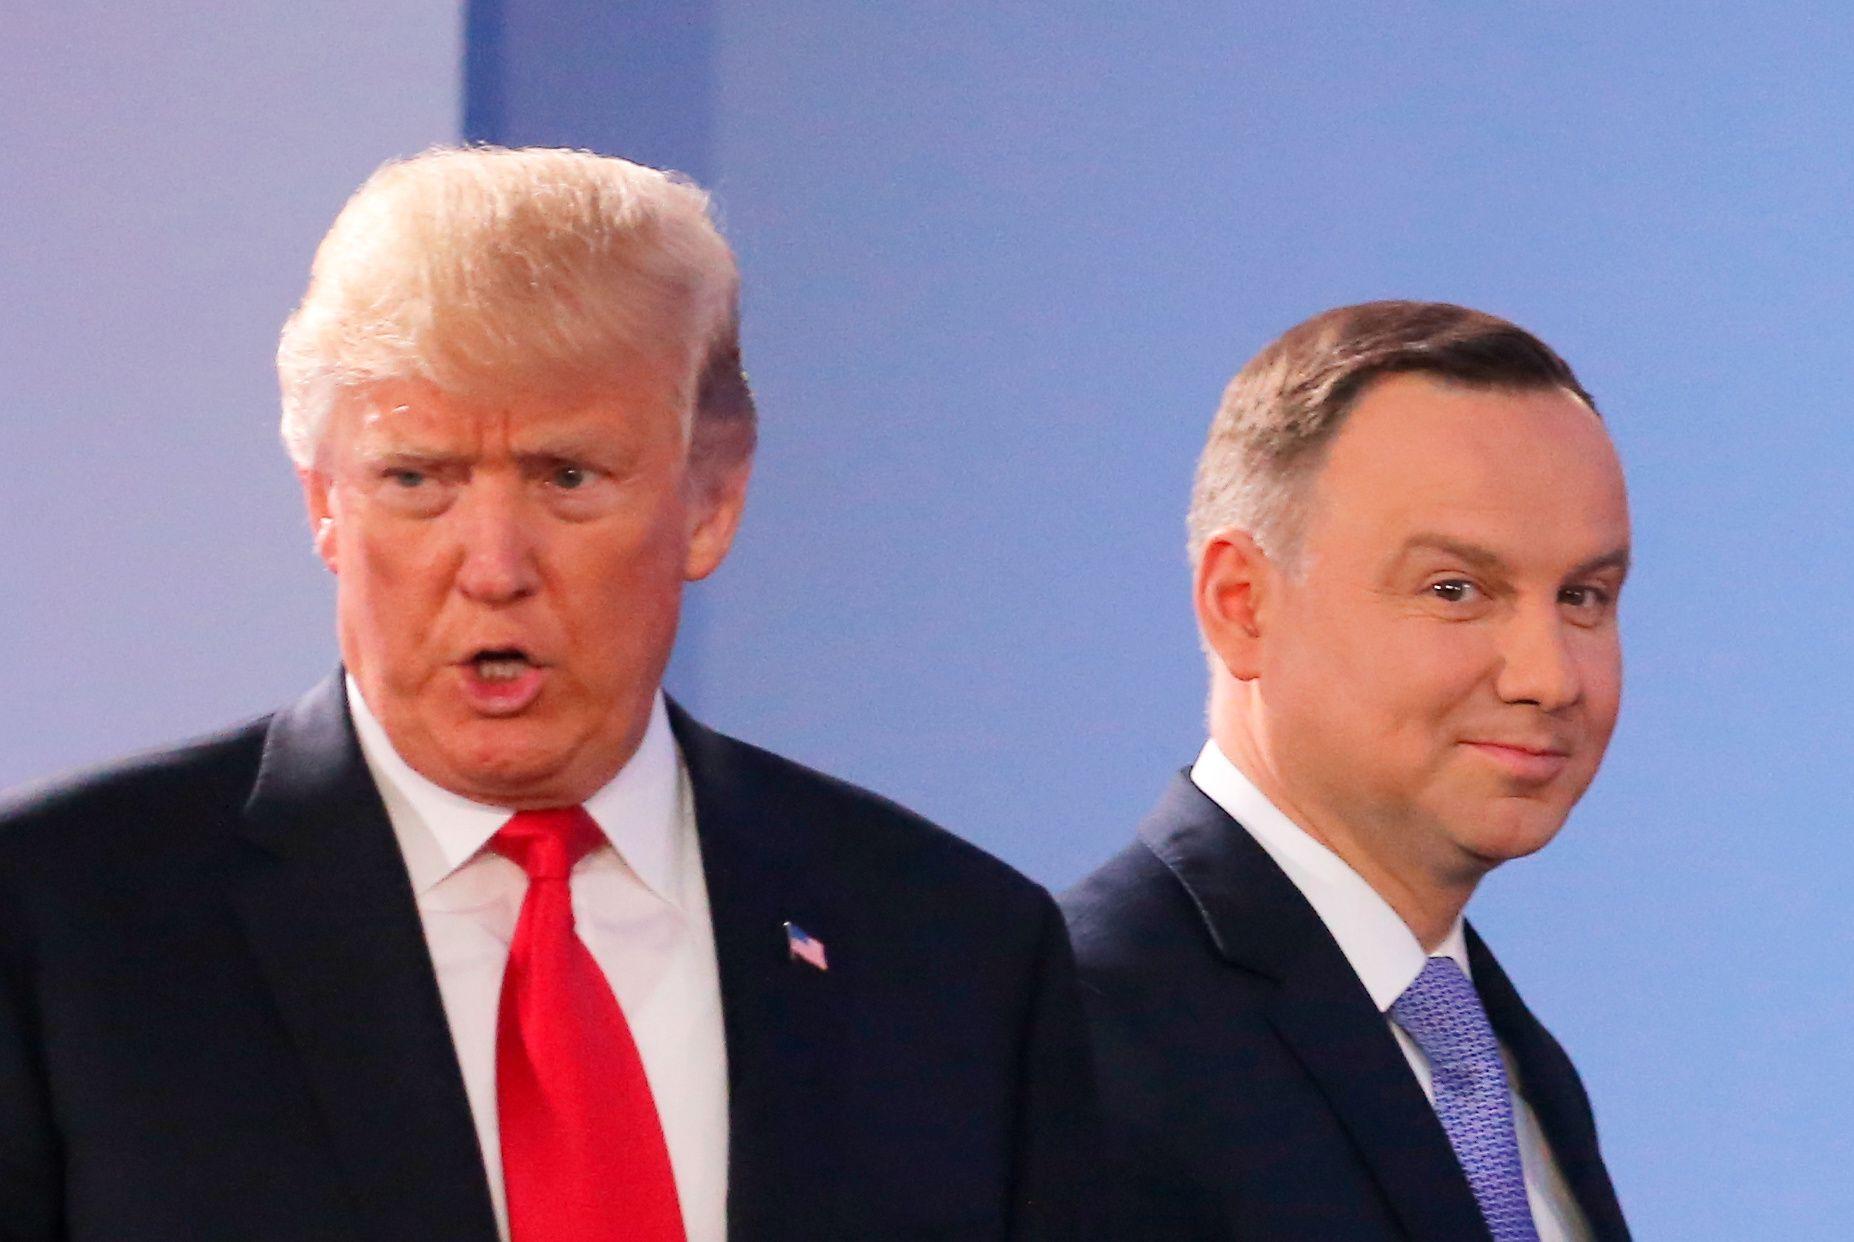 Donald Trump In Poland